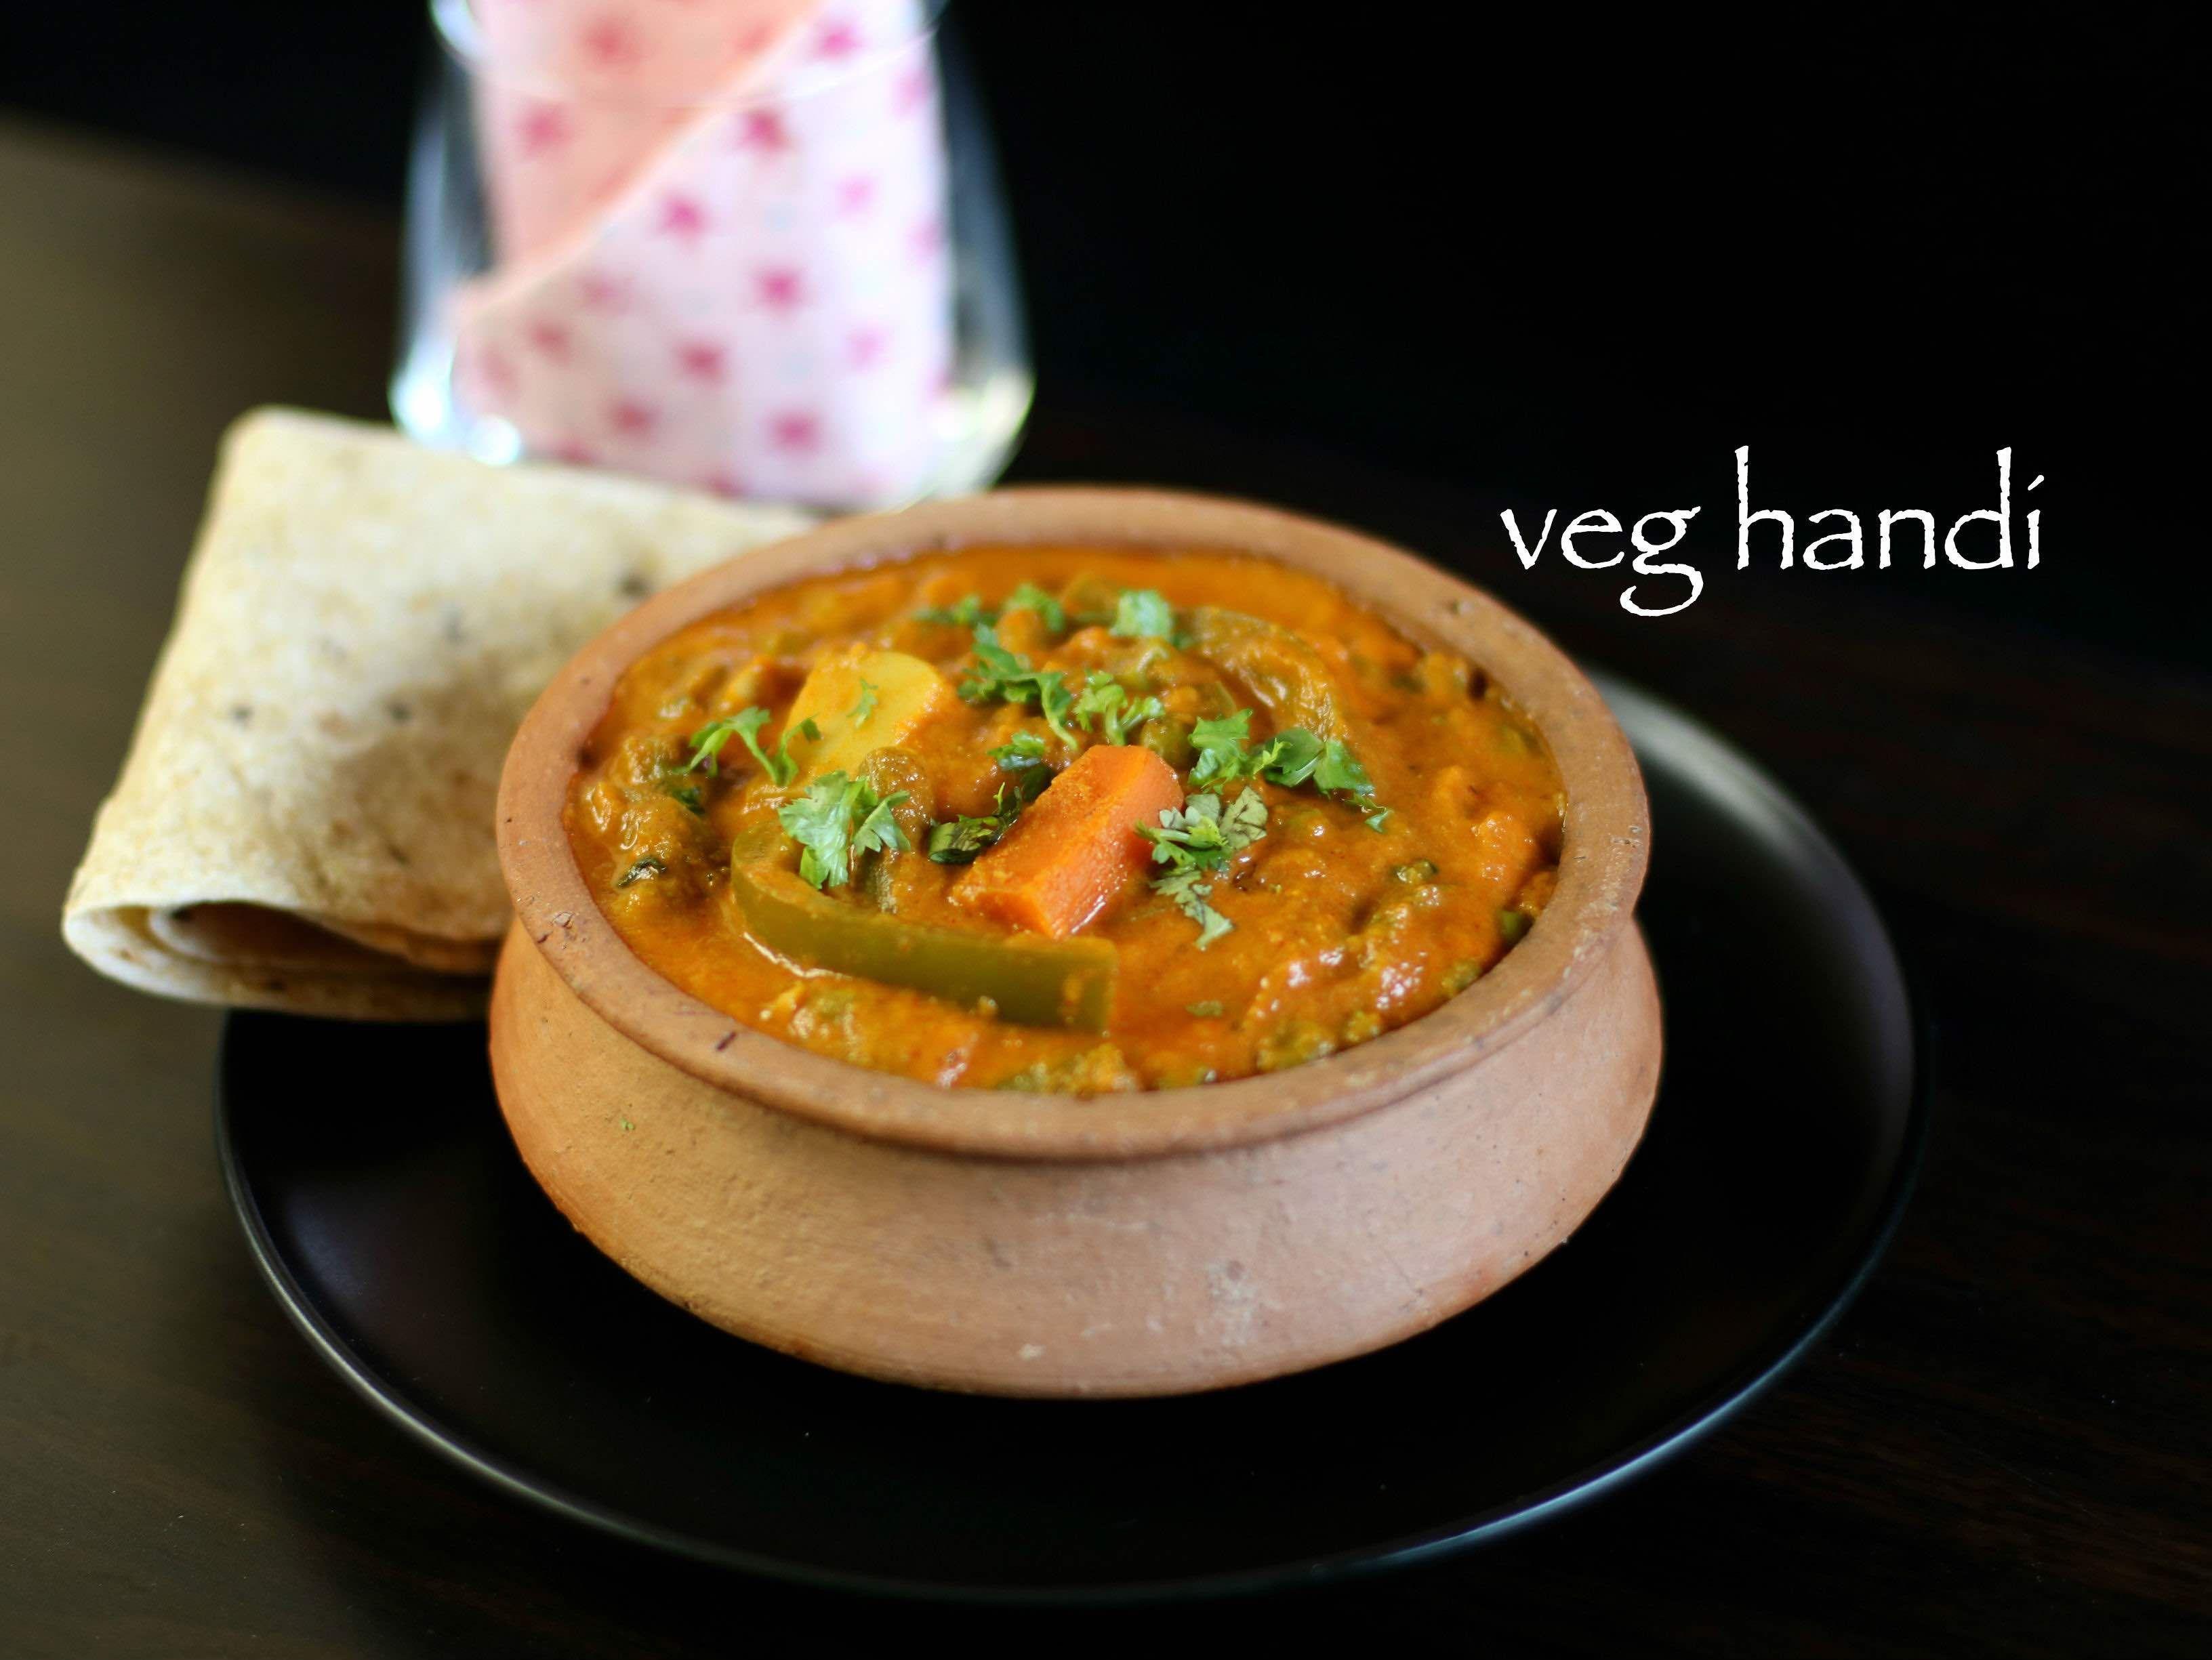 Veg handi recipe veg diwani handi recipe mixed vegetable handi recipes for bengali sweet dish without fire on mytaste youll find 681 recipes for bengali sweet dish without fire as well as thousands of similar recipes forumfinder Images